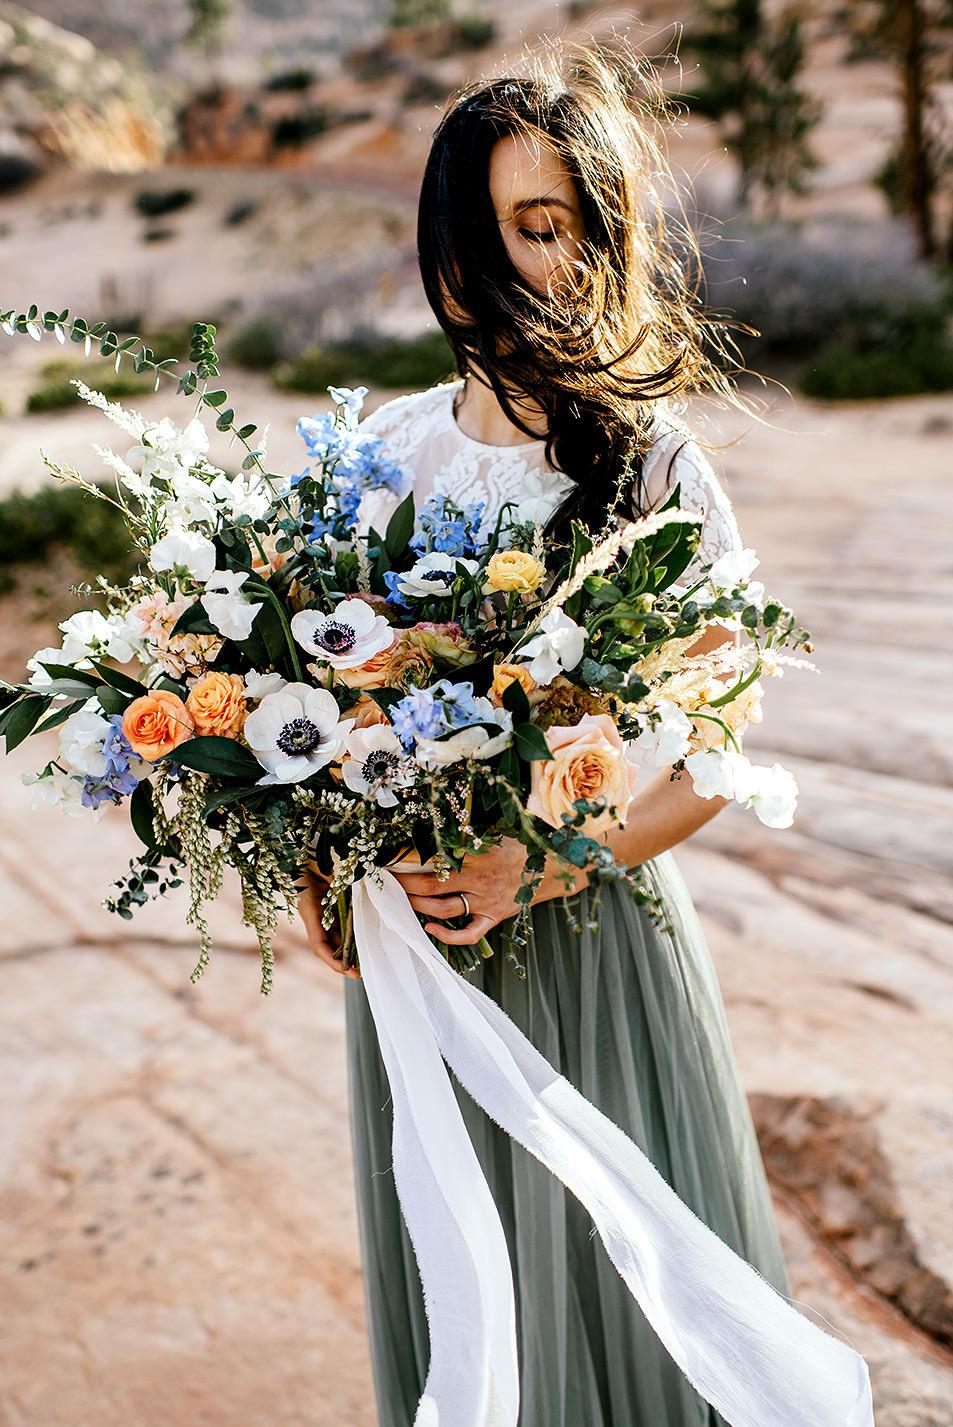 Zion_National_Park_Arizona_Wedding_Photographer_021.jpg